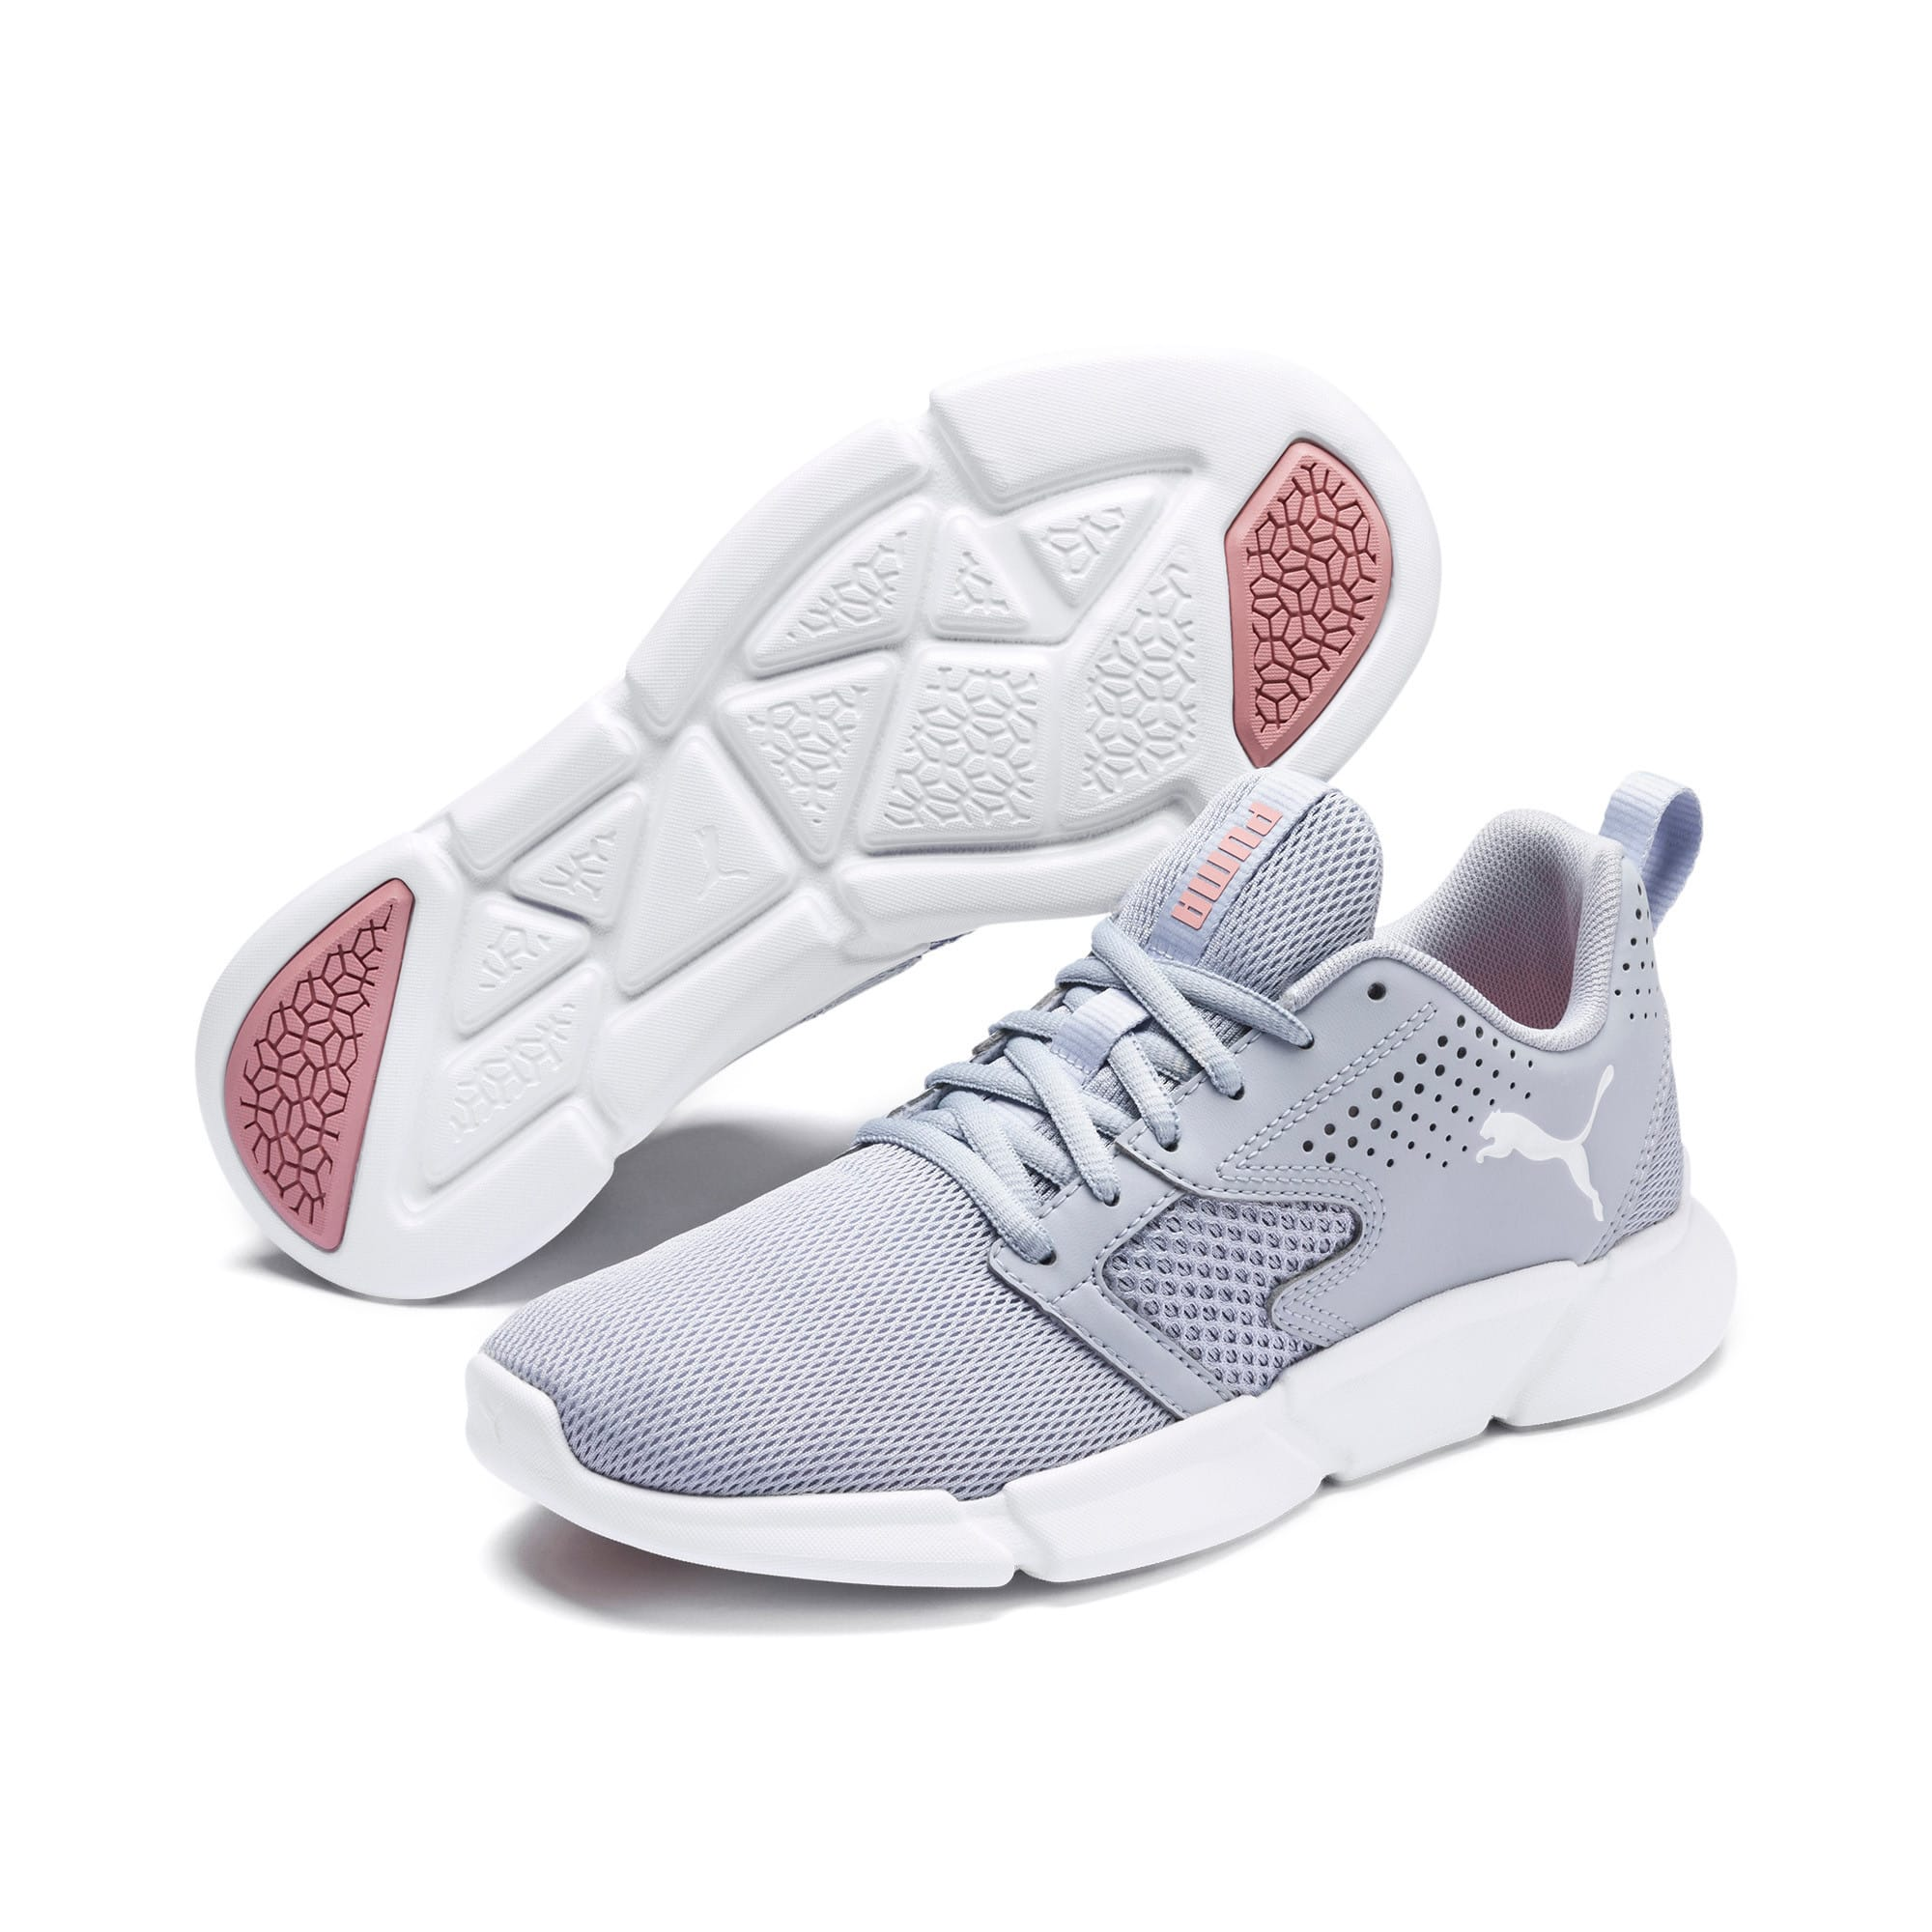 Thumbnail 8 of INTERFLEX Modern Running Shoes, Grey Dawn-Bridal Rose, medium-IND